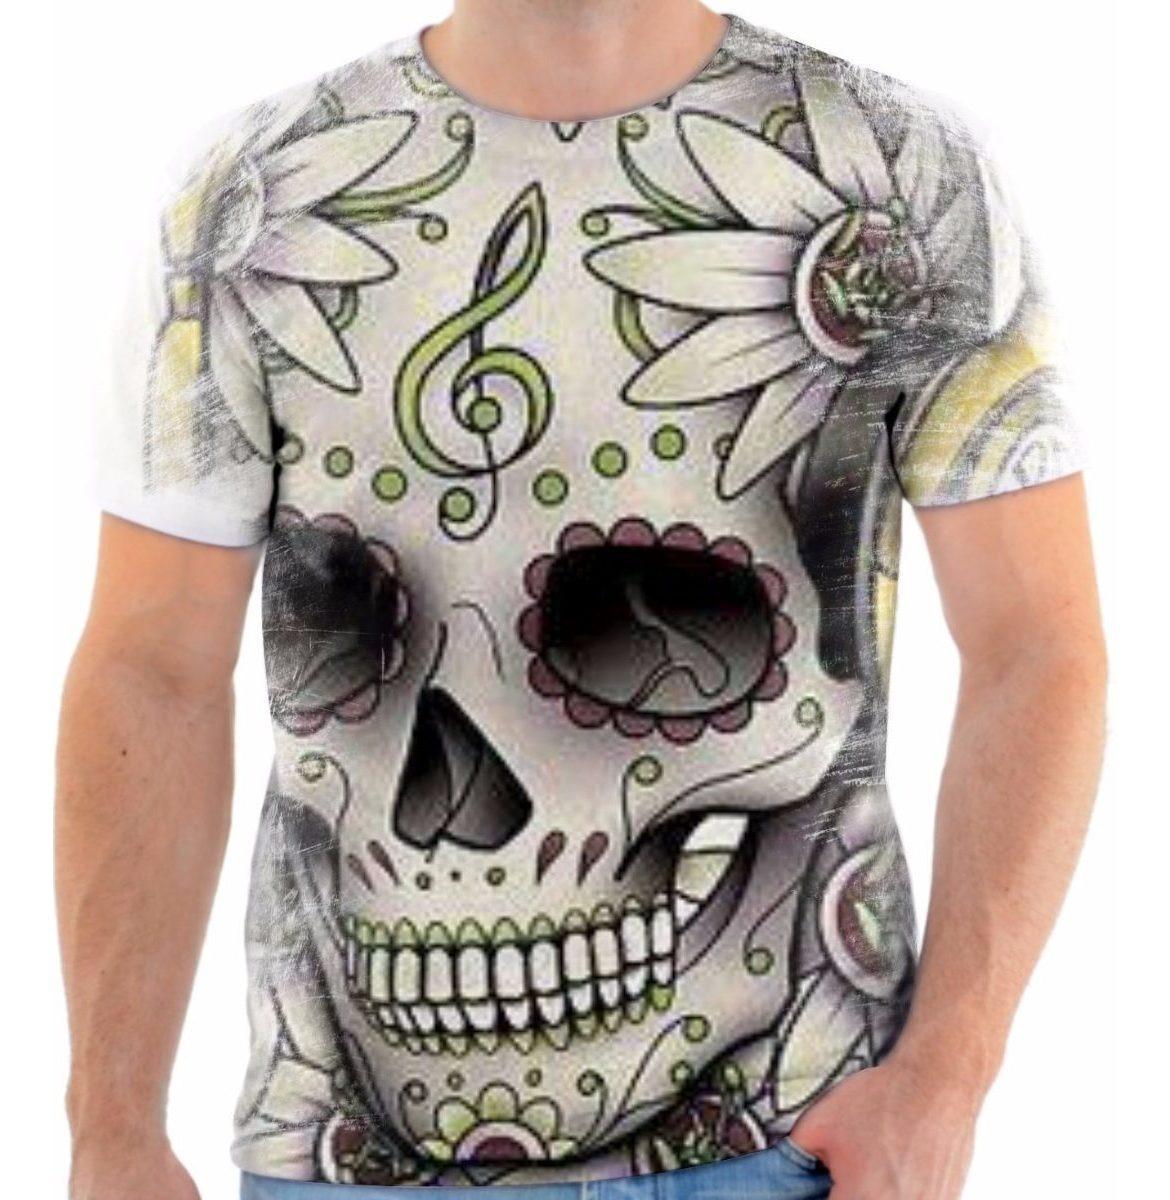 Camisa Camiseta Musica Caveira Skull Flor Desenho Linda